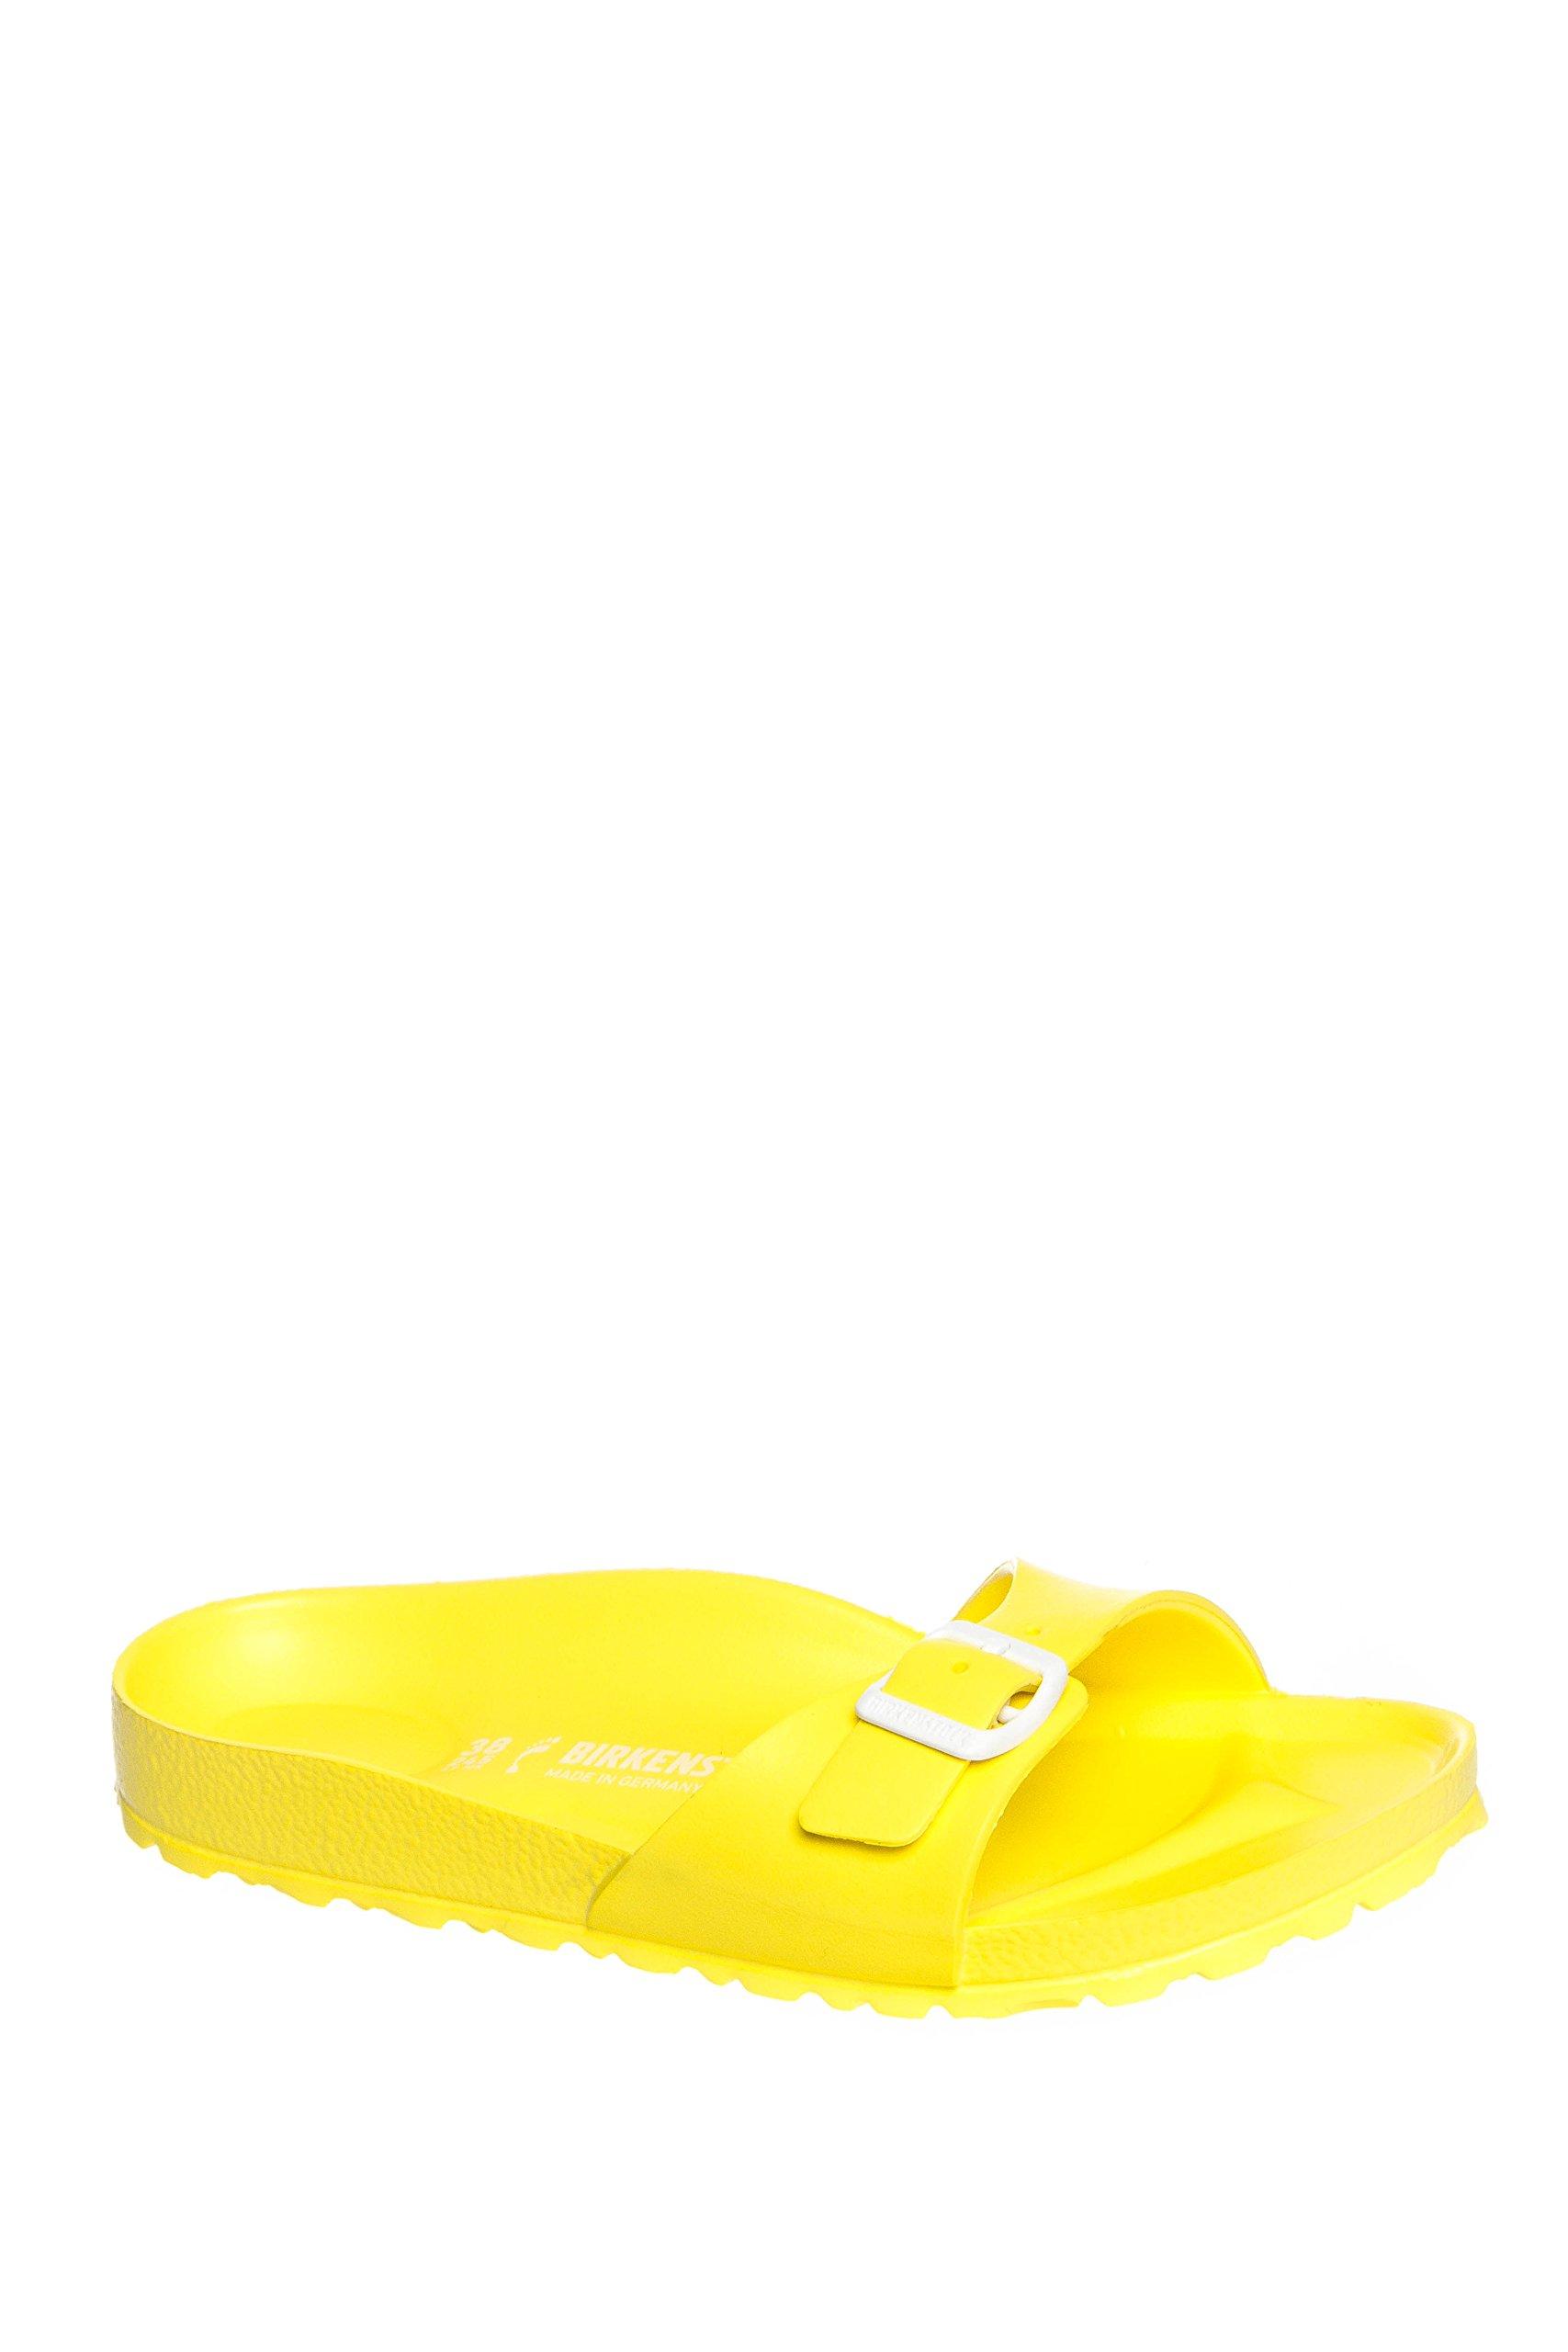 e87413df217 Galleon - Birkenstock Madrid EVA Slide Sandal Shoe - Neon Yellow - Womens -  37